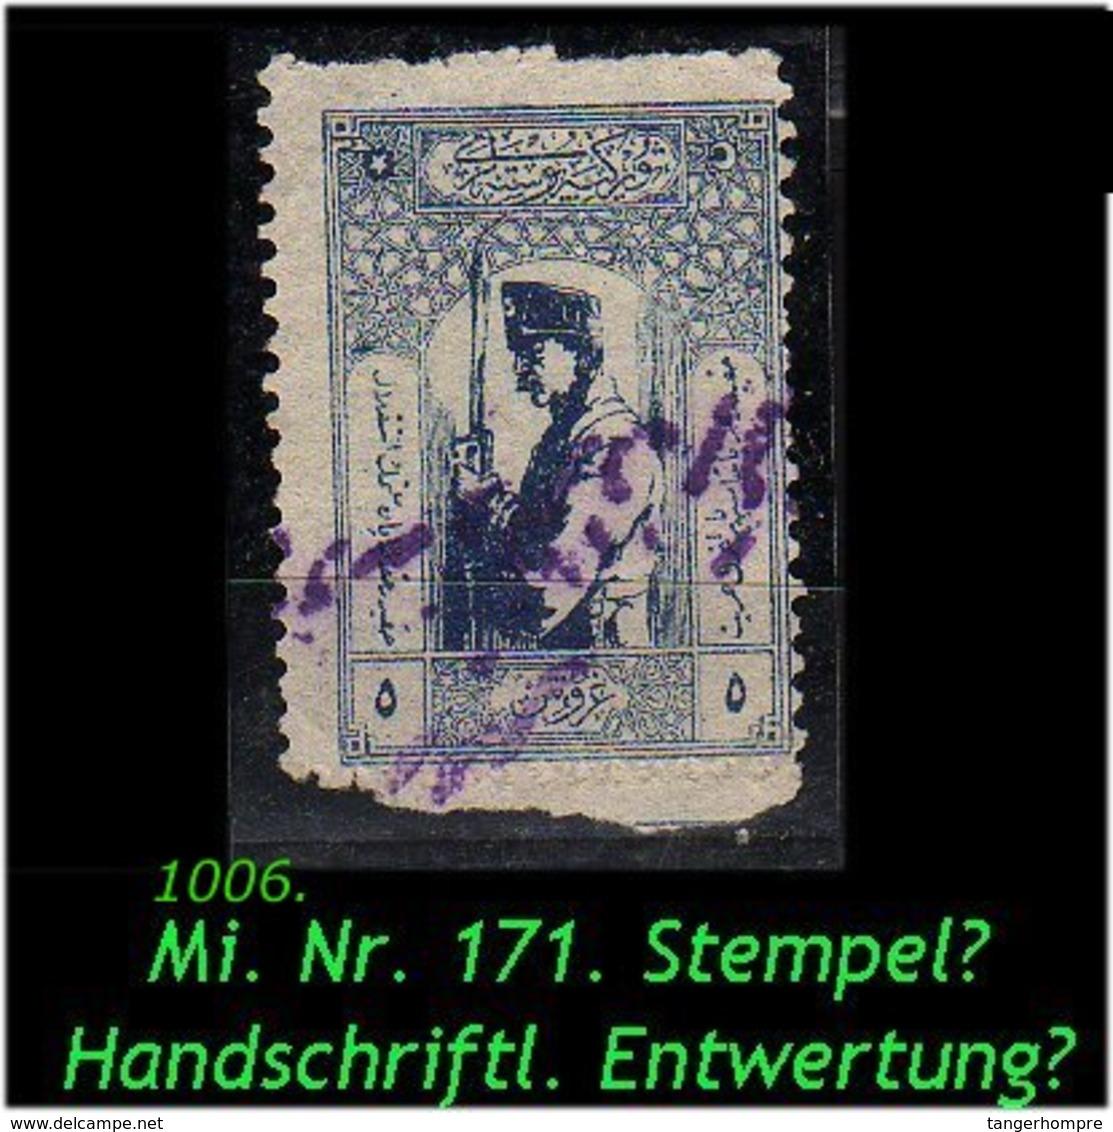 EARLY OTTOMAN SPECIALIZED FOR SPECIALIST, SEE...Mi. Nr. 771 -Handschriftliche Entwertung ? Zensurstpl.? !! -R- - Nuevos